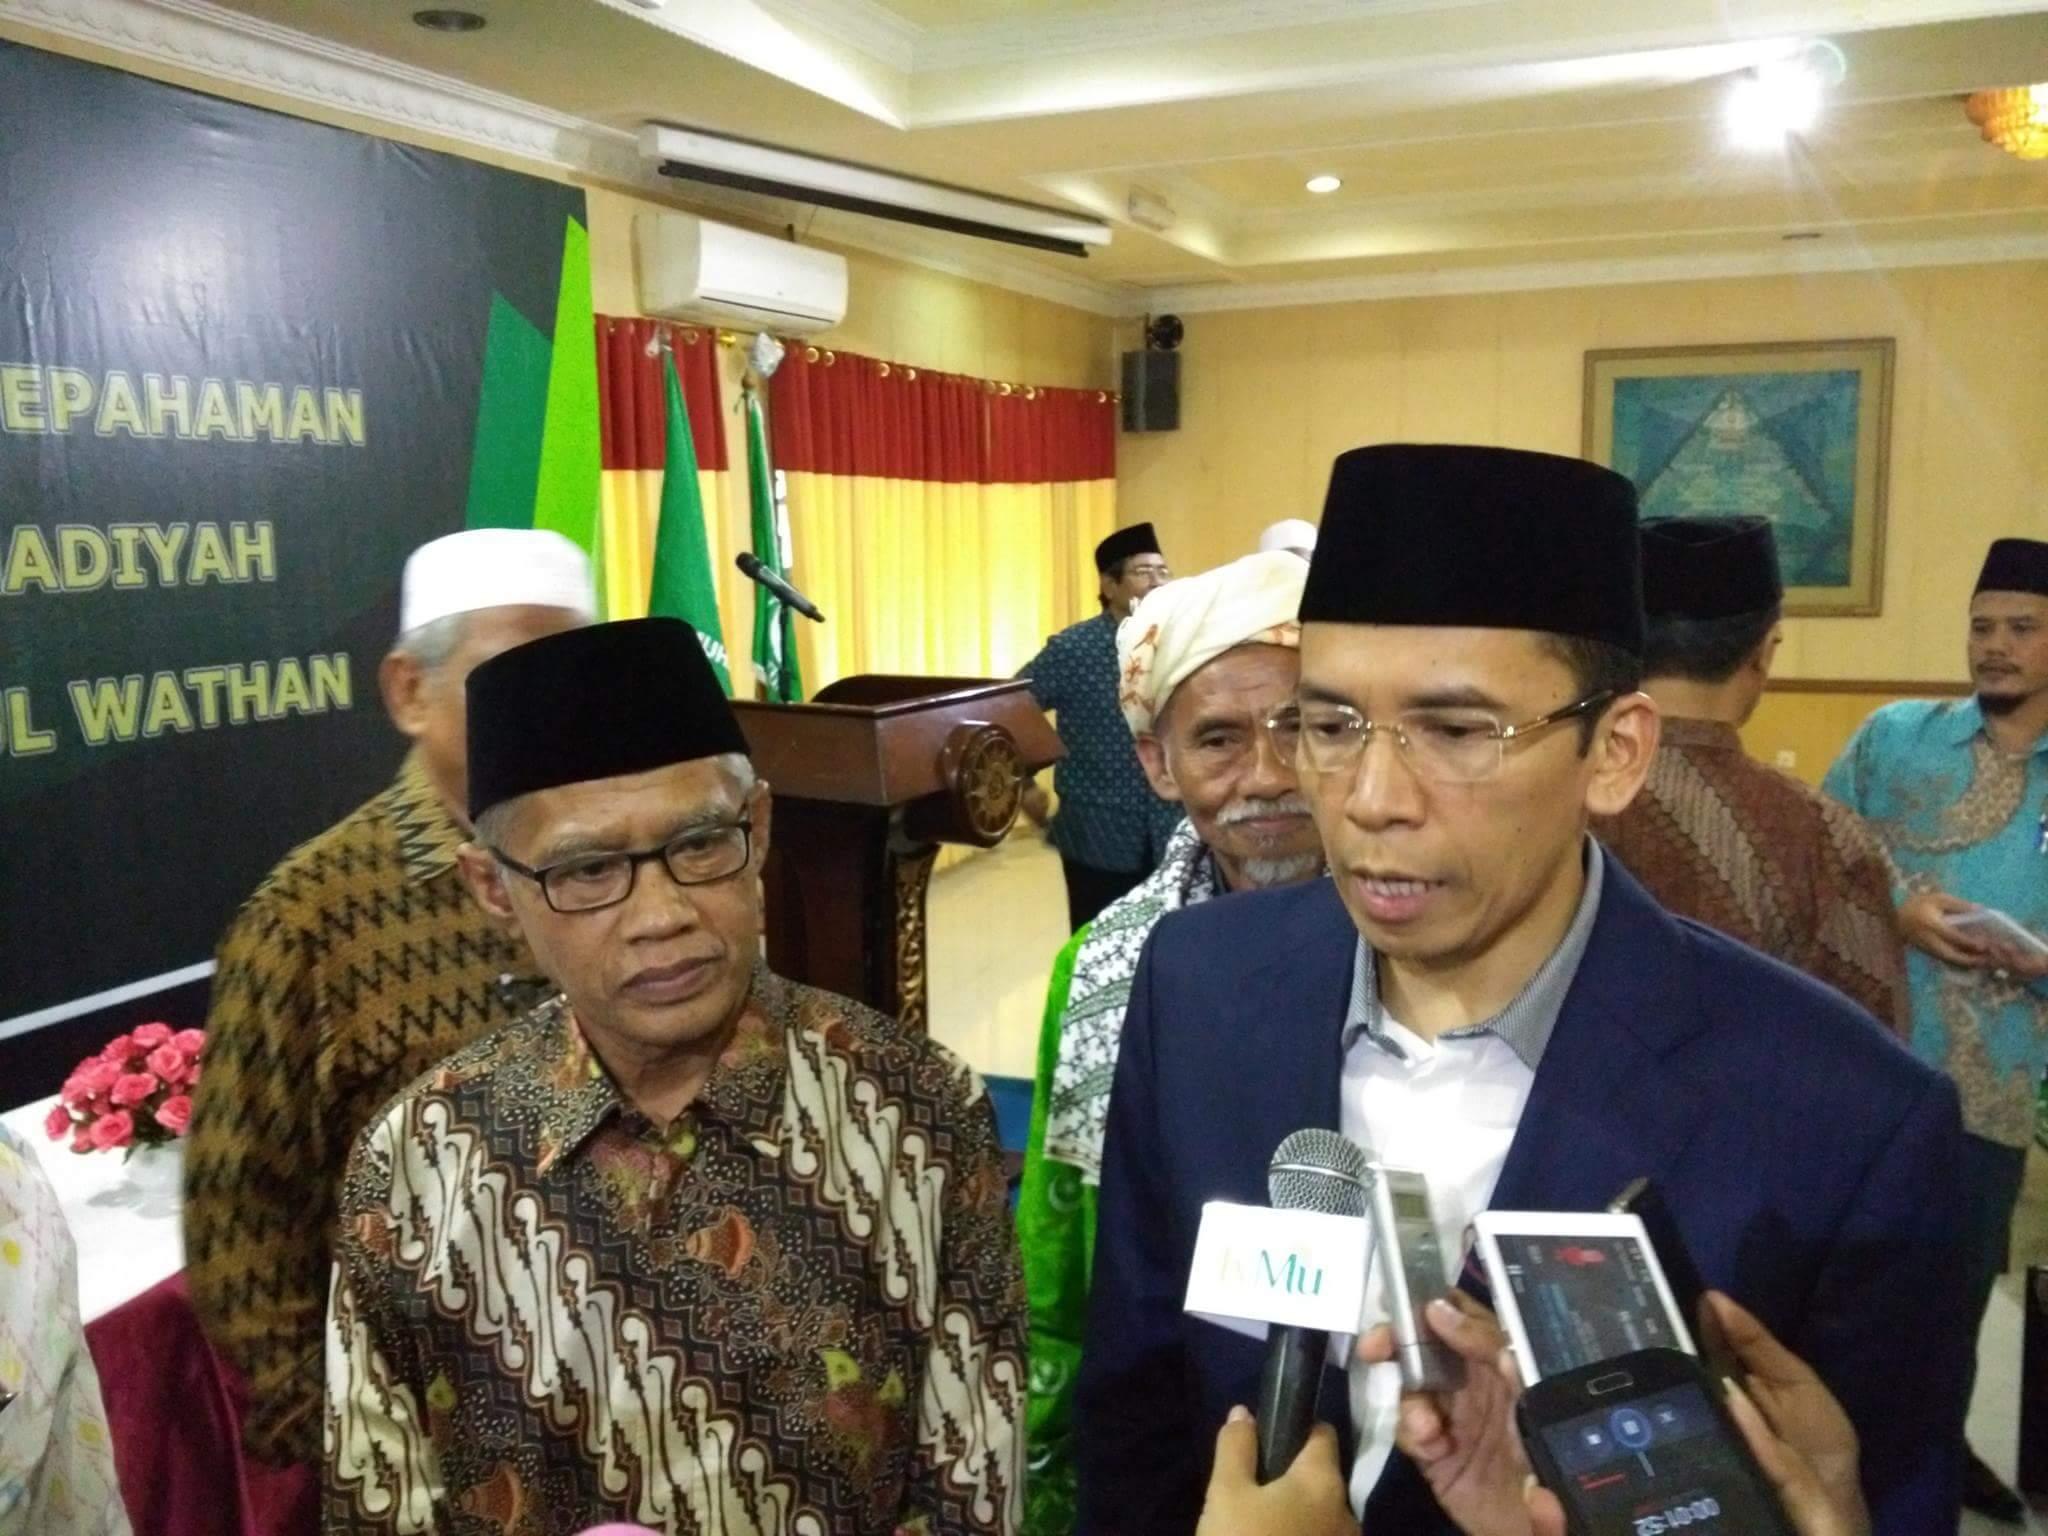 Muhammadiyah Jalin Kerjasama Dengan Nahdhatul Wathaniyah Perkuat Ukhuwah Islamiyyah